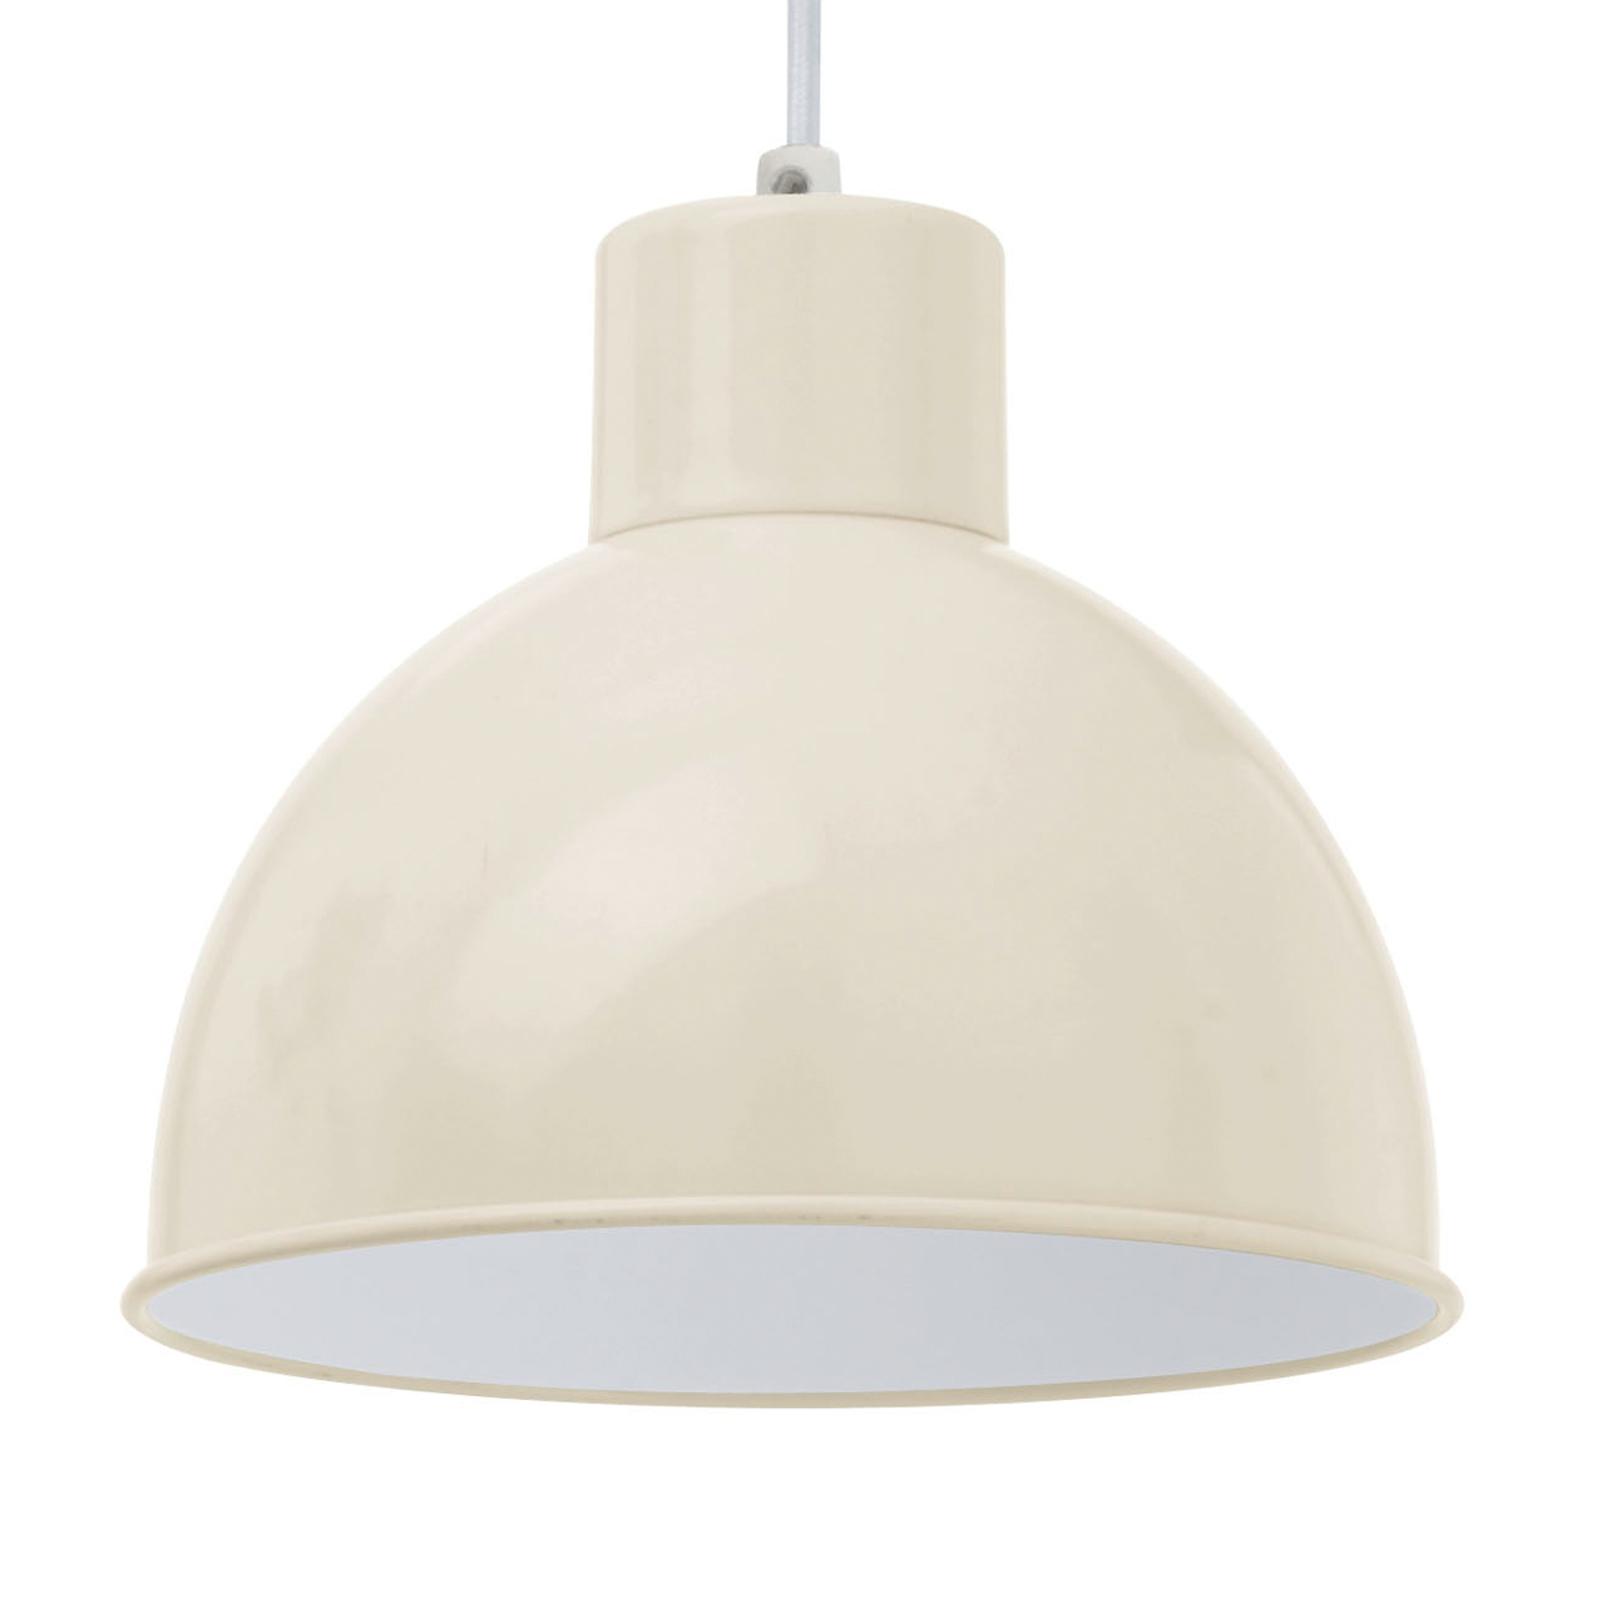 Andrin Sand-coloured Pendant Lamp - White Interior_3031604_1